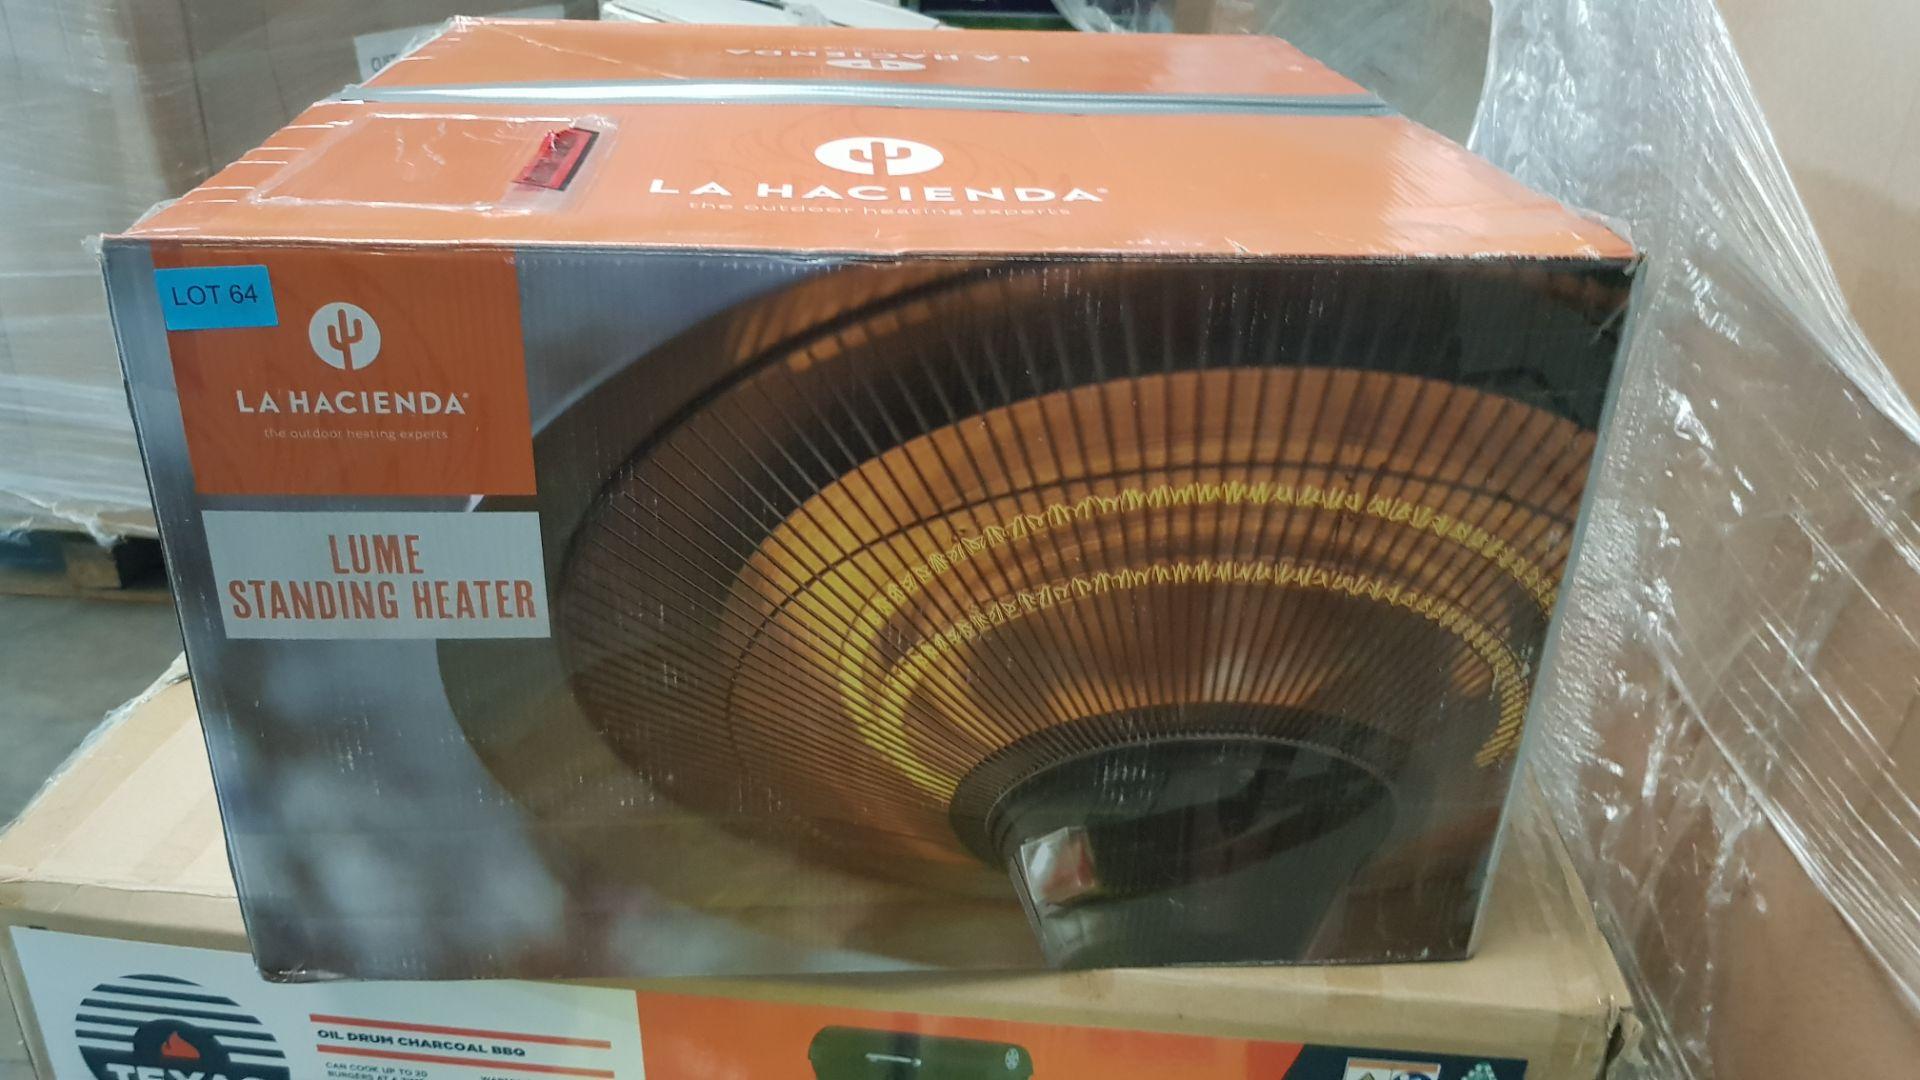 (P5) 1x La Hacienda Lume Standing Heater RRP £99.99. 3 Heater Settings: 900W, 1200W & 2100W (H205 - Image 2 of 3